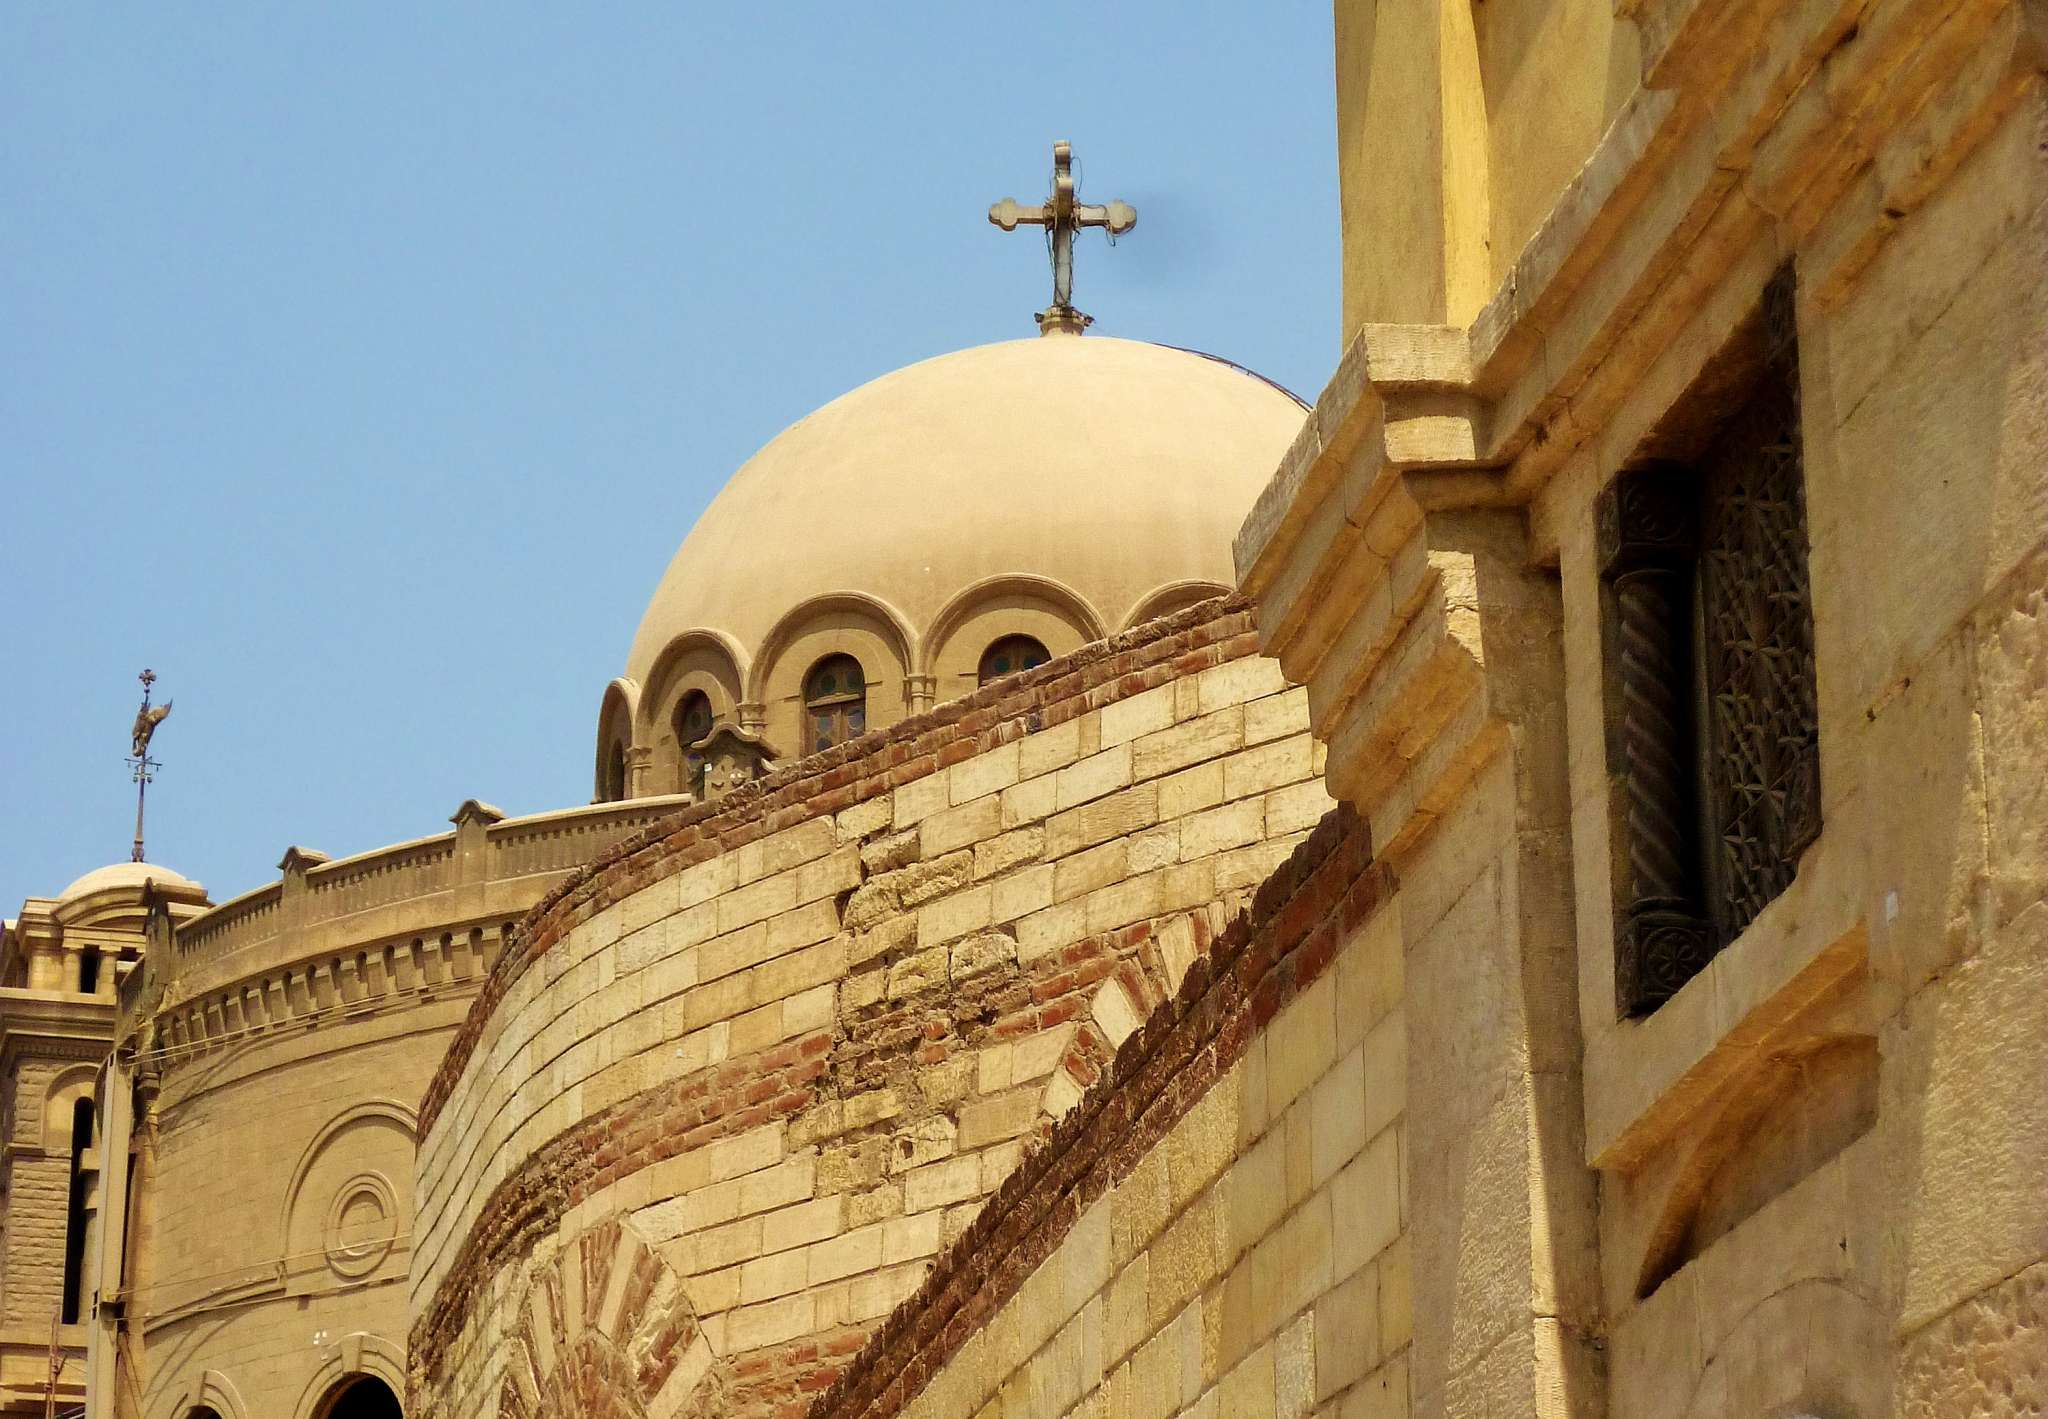 The Coptic Winter Continues